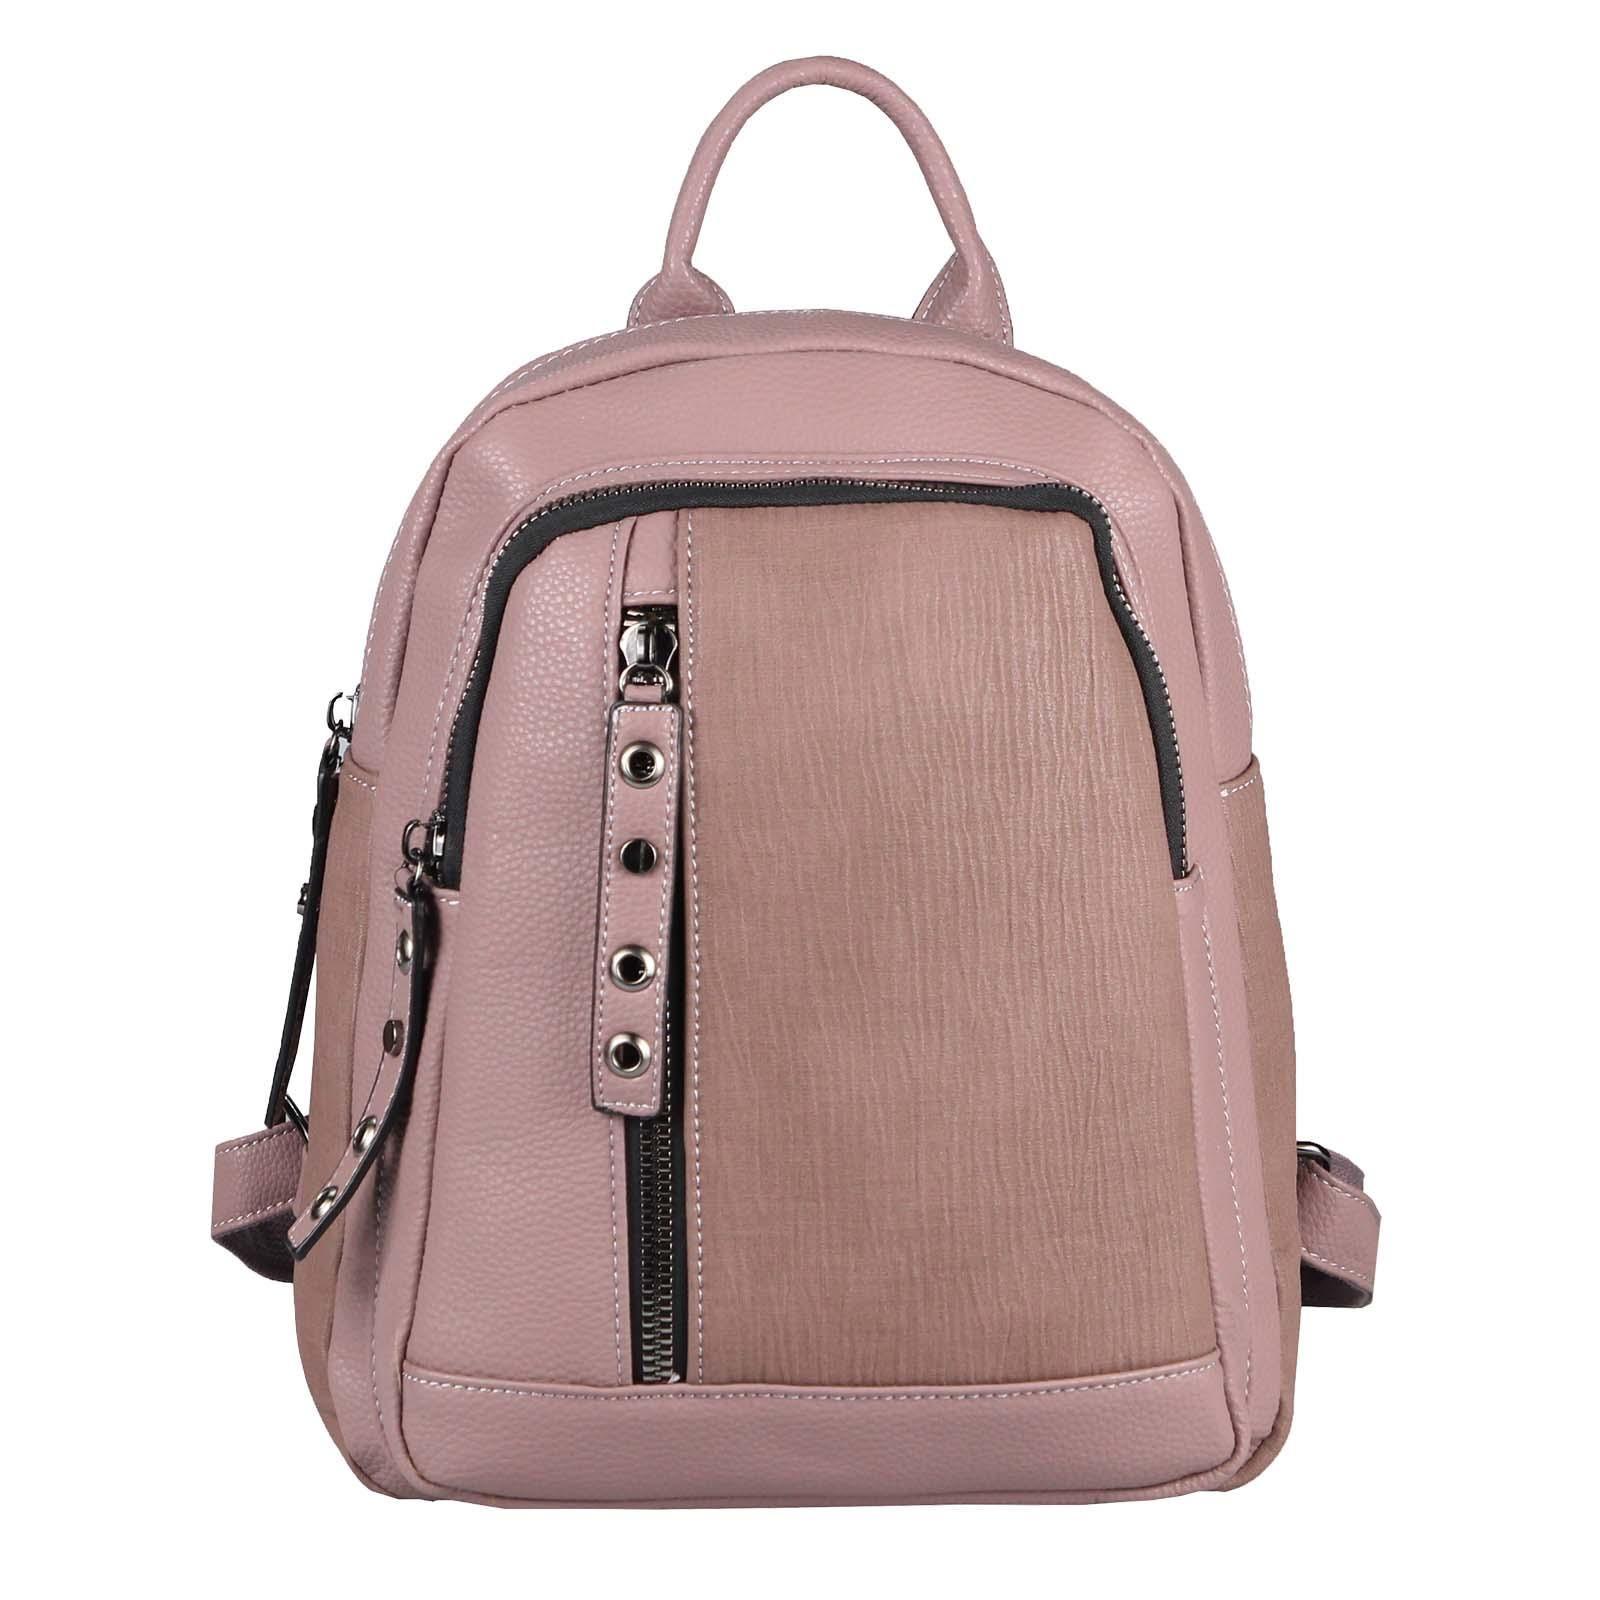 Damen Rucksack Tasche Cityrucksack Stadtrucksack Daypack Backpack Schultertasche Handtasche Umhangetasche Shopper Reise Altrosa Handtasche Umhangetasche Schultertasche Rucksack Tasche